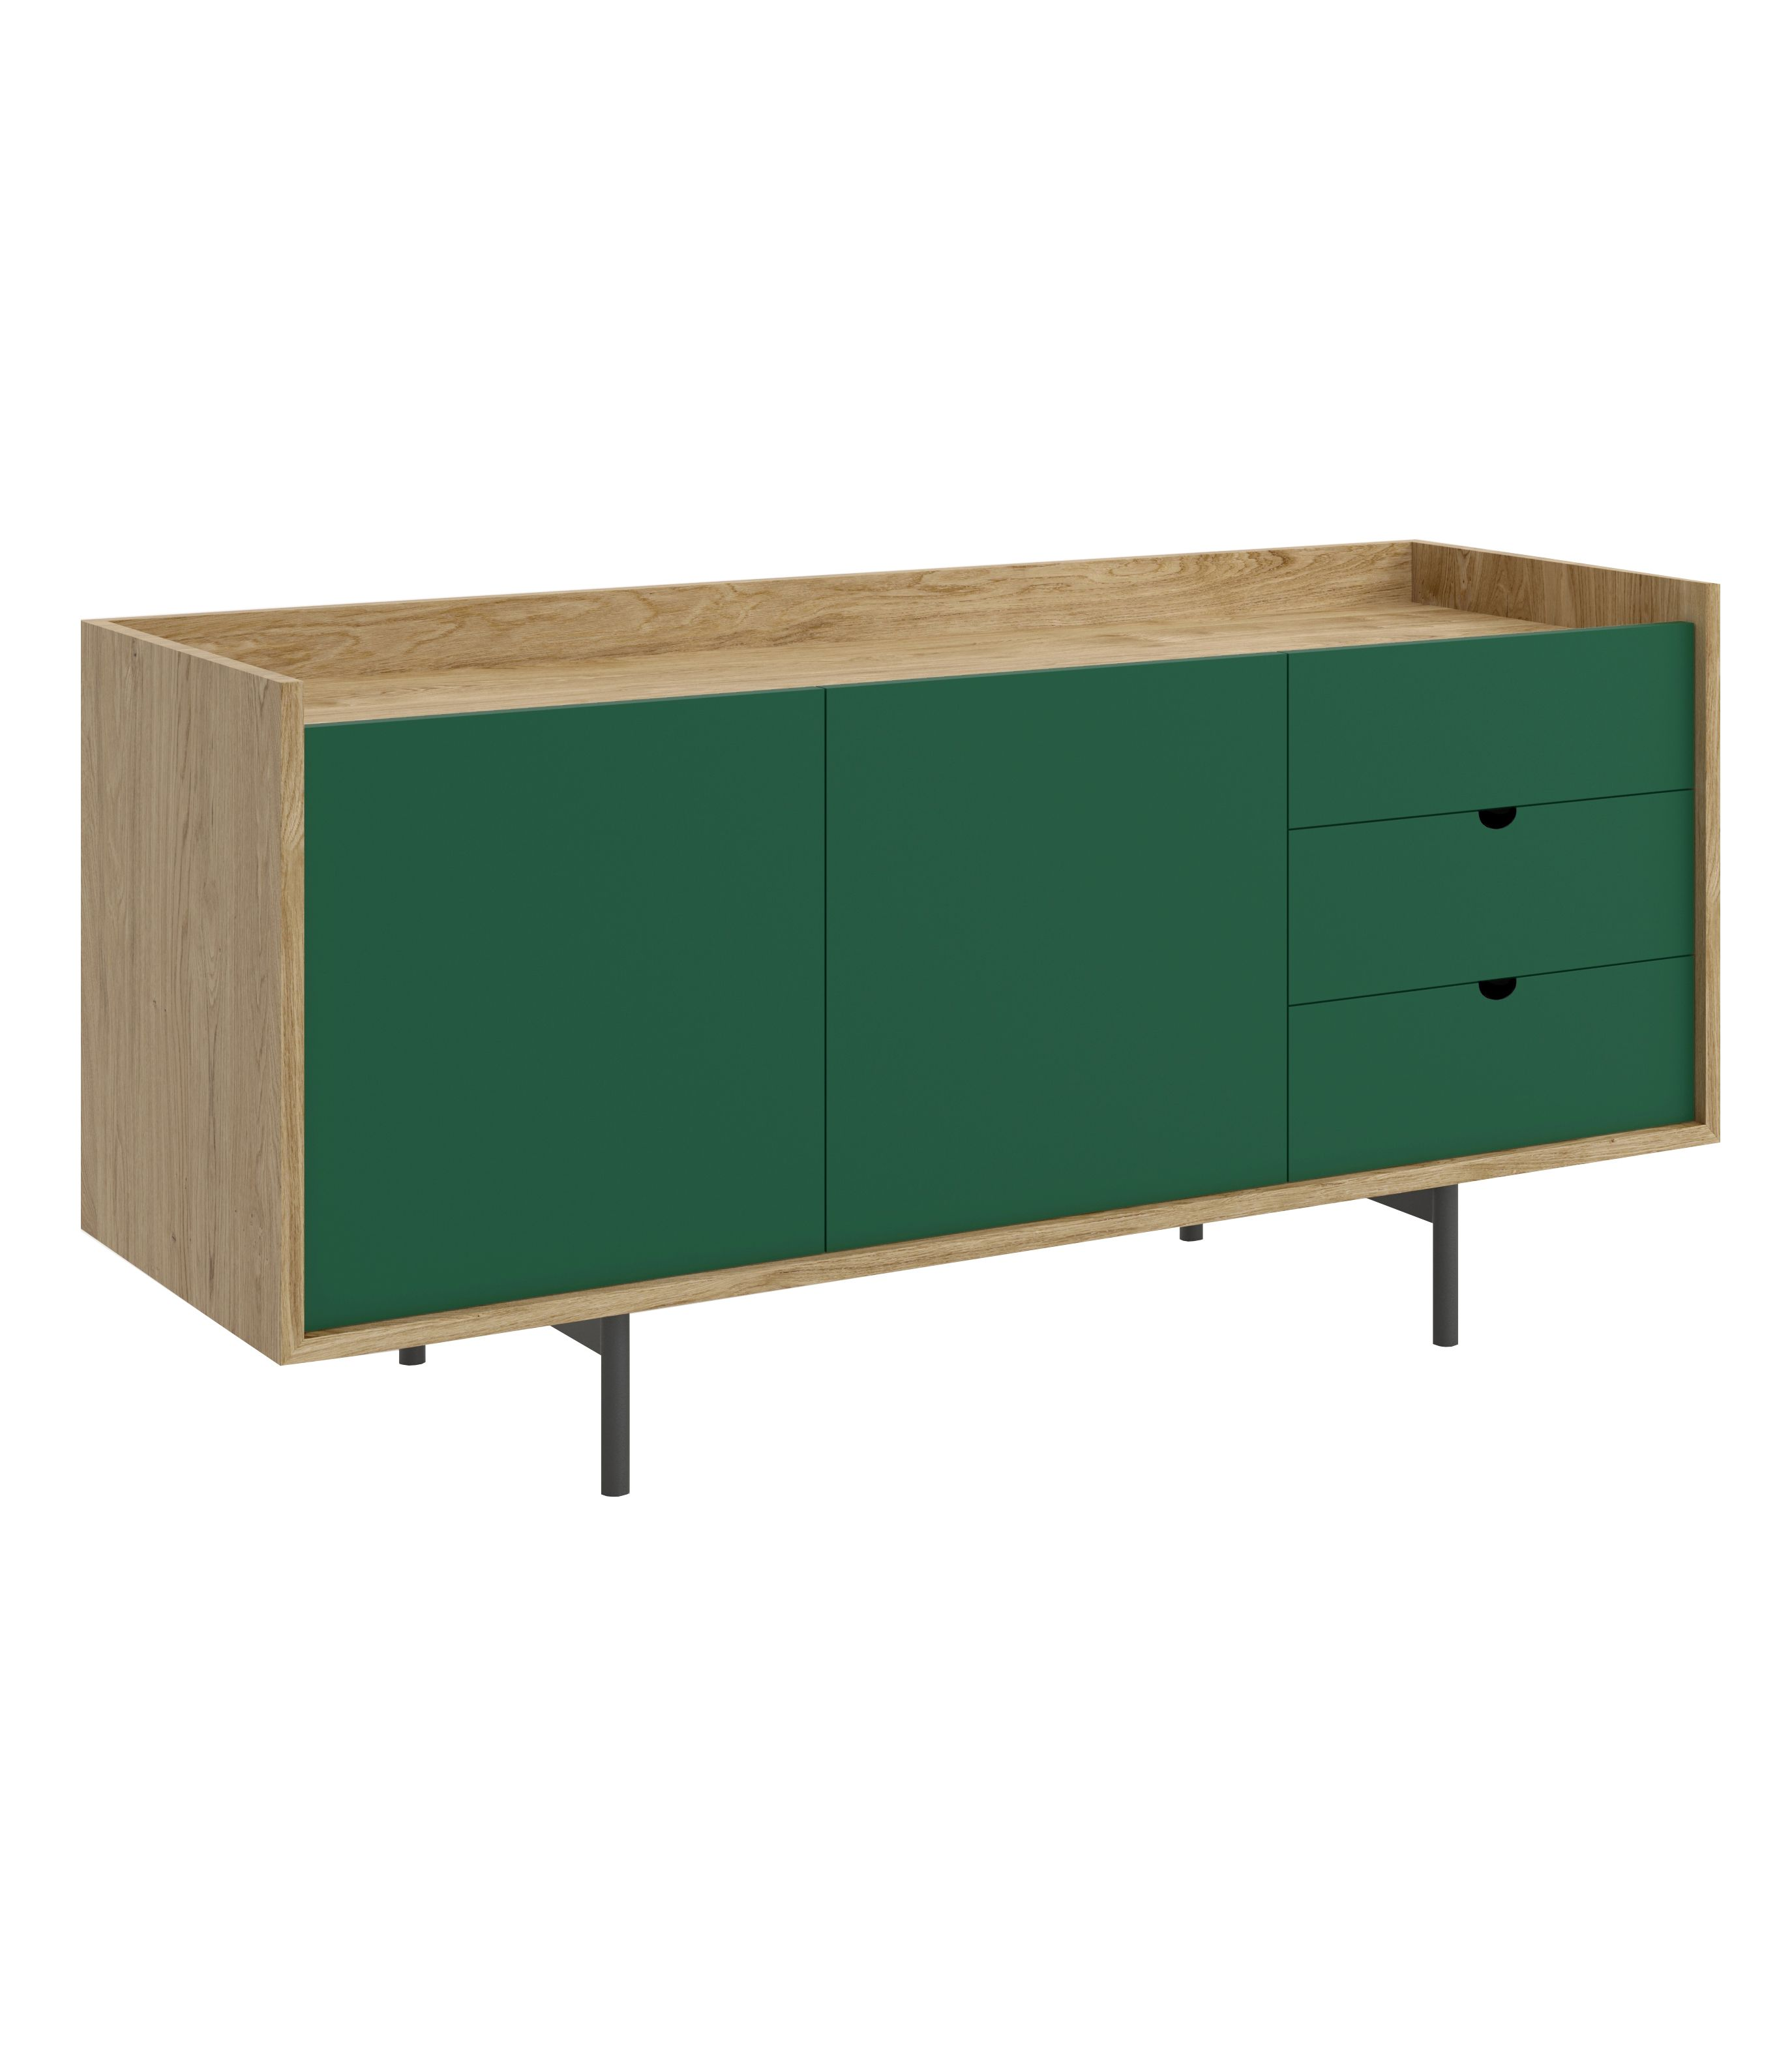 zielona szafka pod telewizor